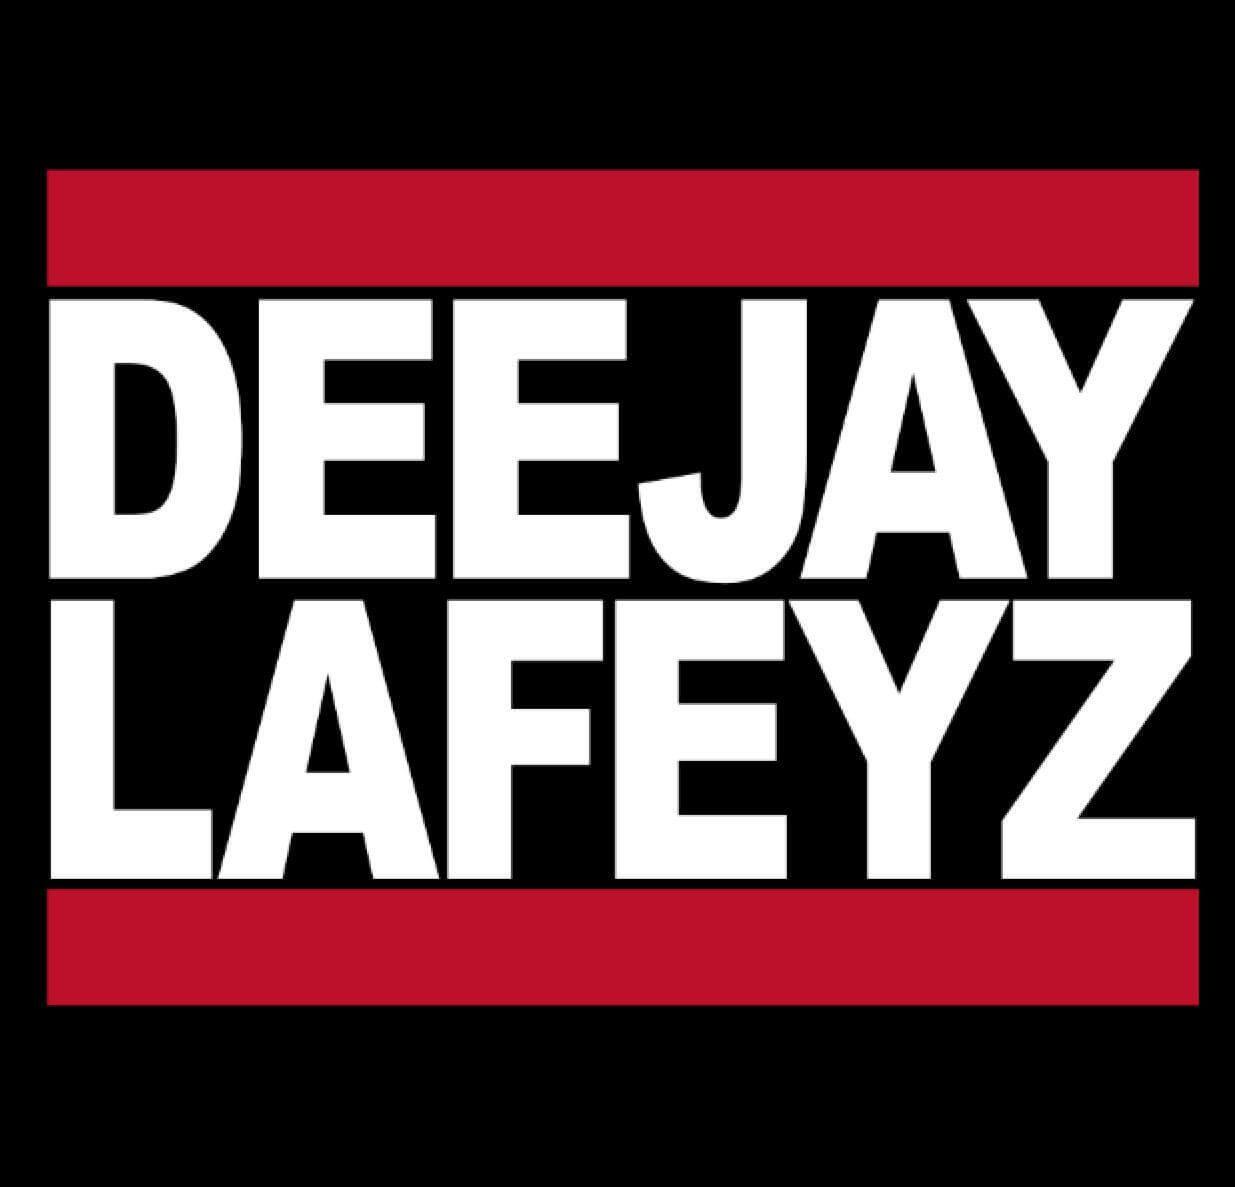 DeeJay LaFeyz